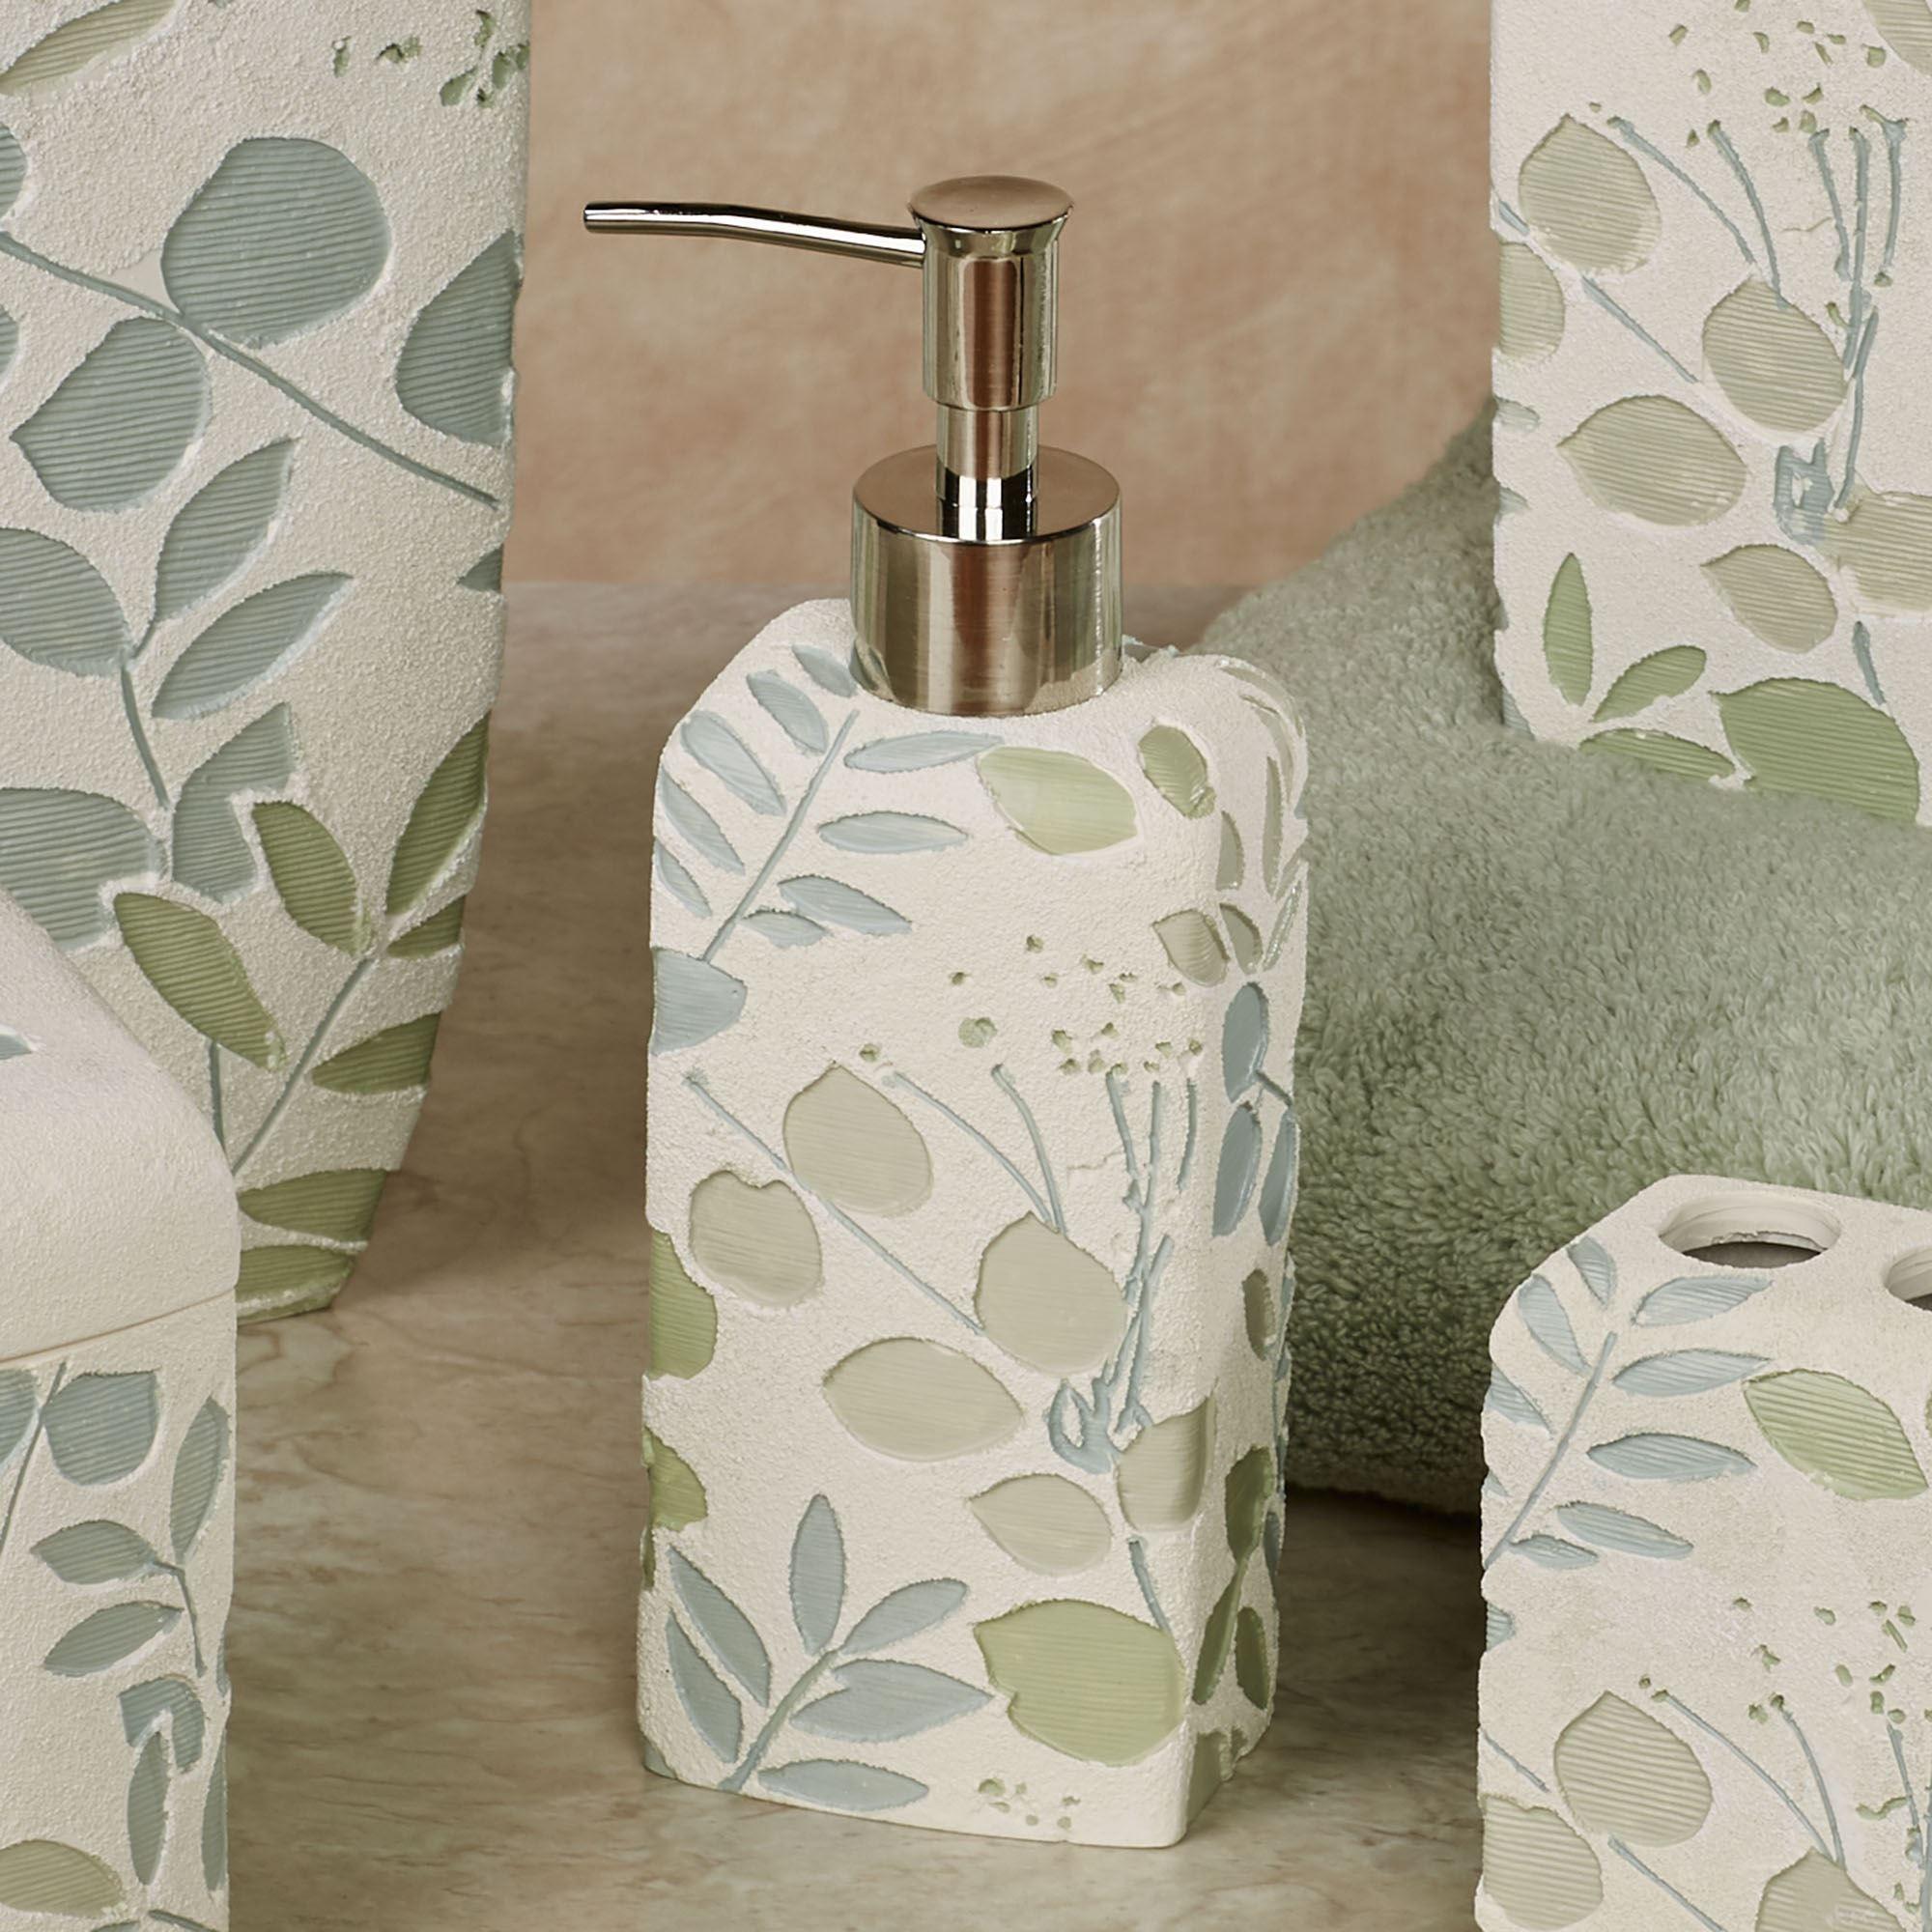 Springtime Botanical Leaf Bath Accessories